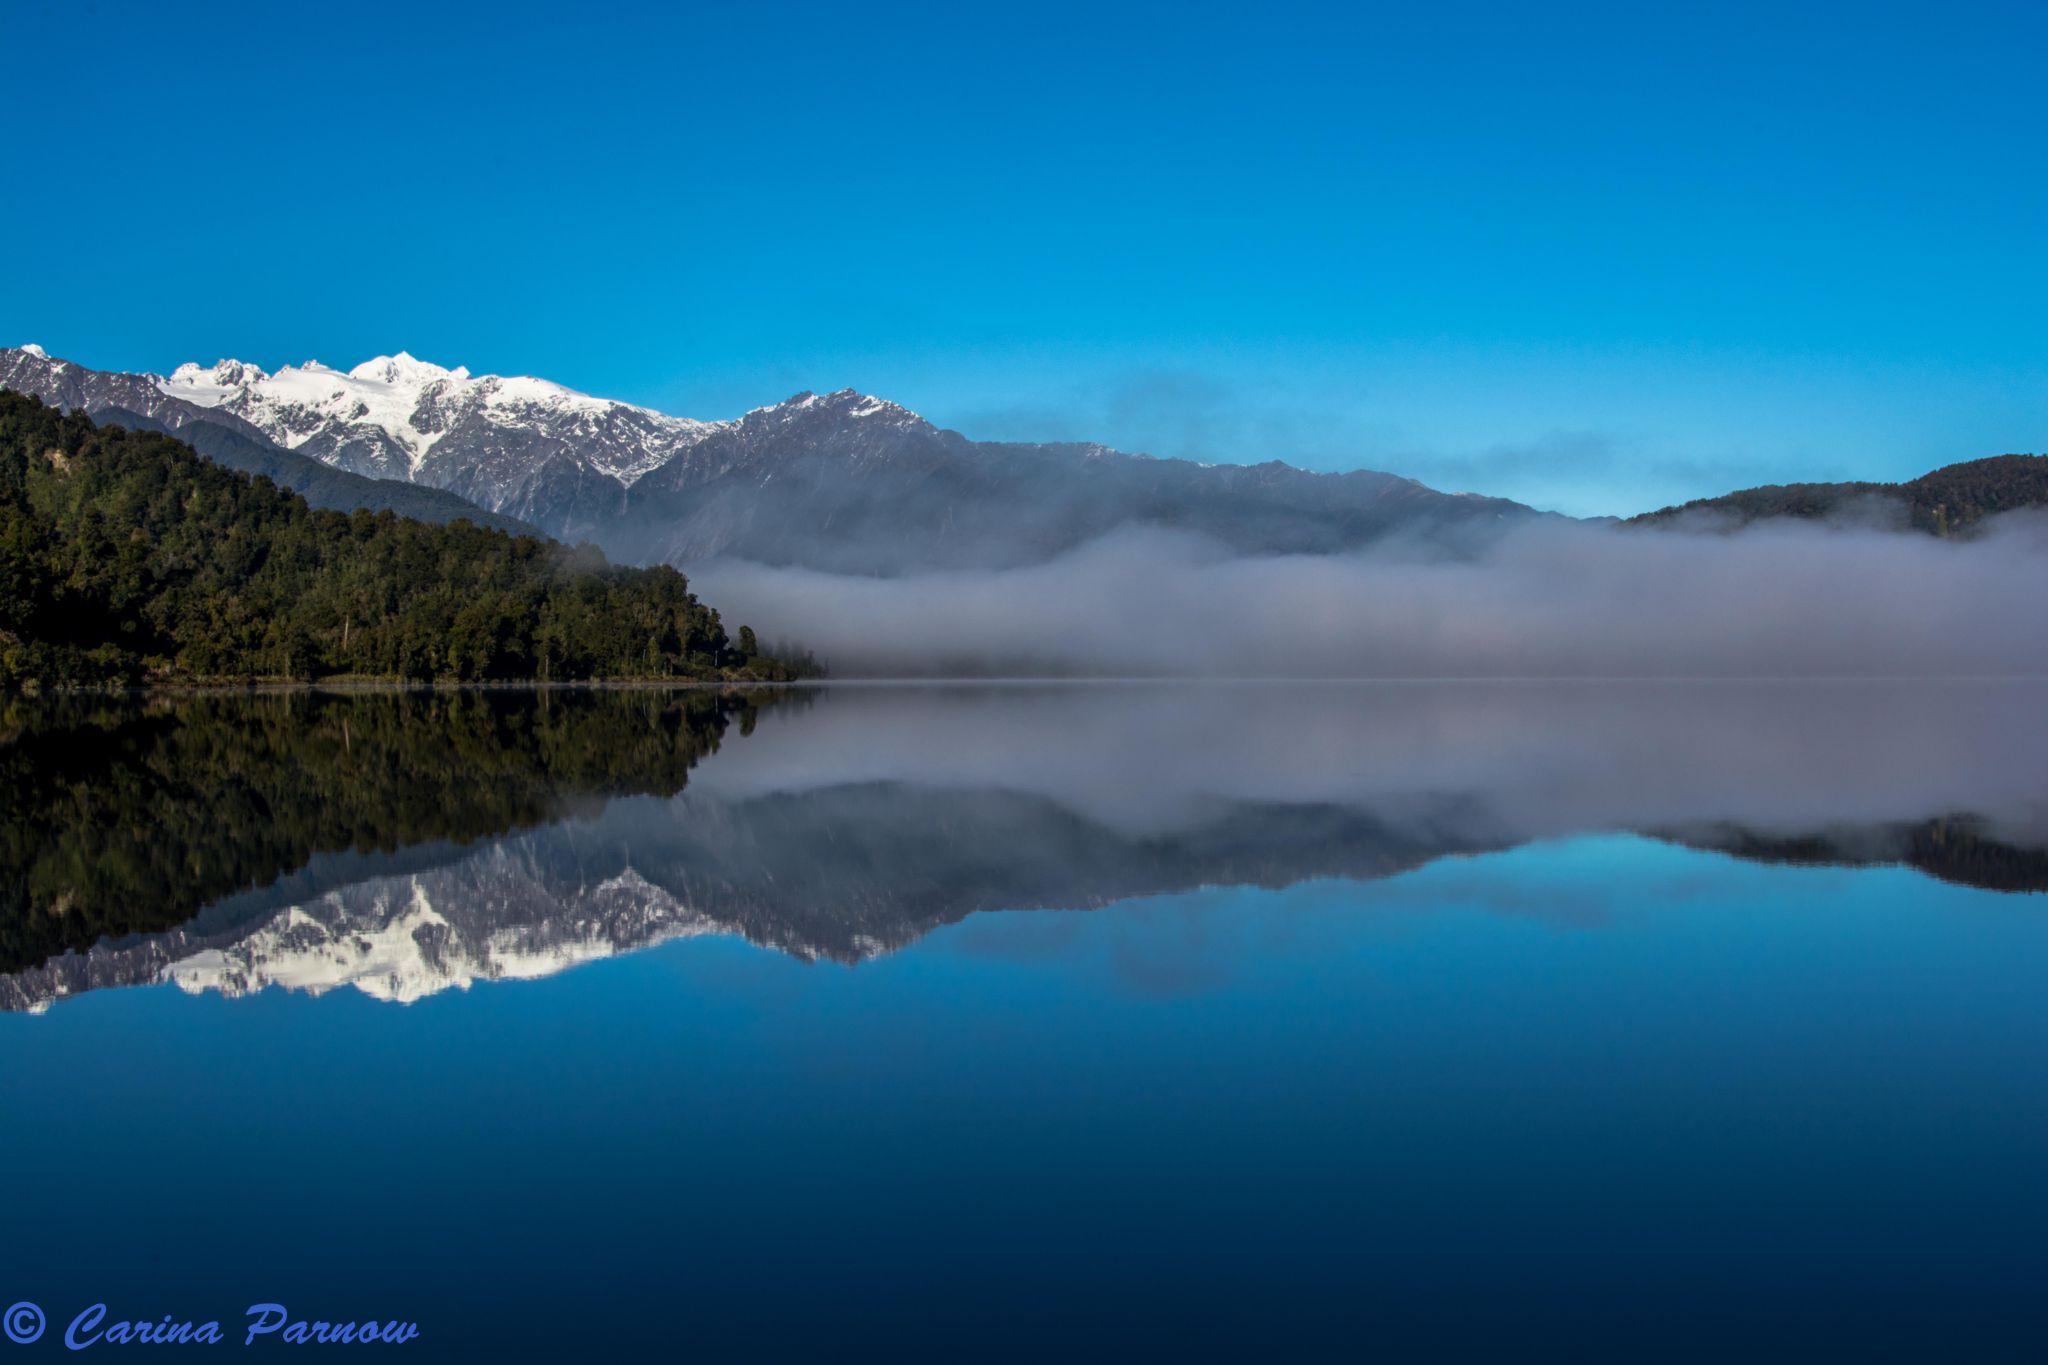 lake mapourika by Carina Parnow